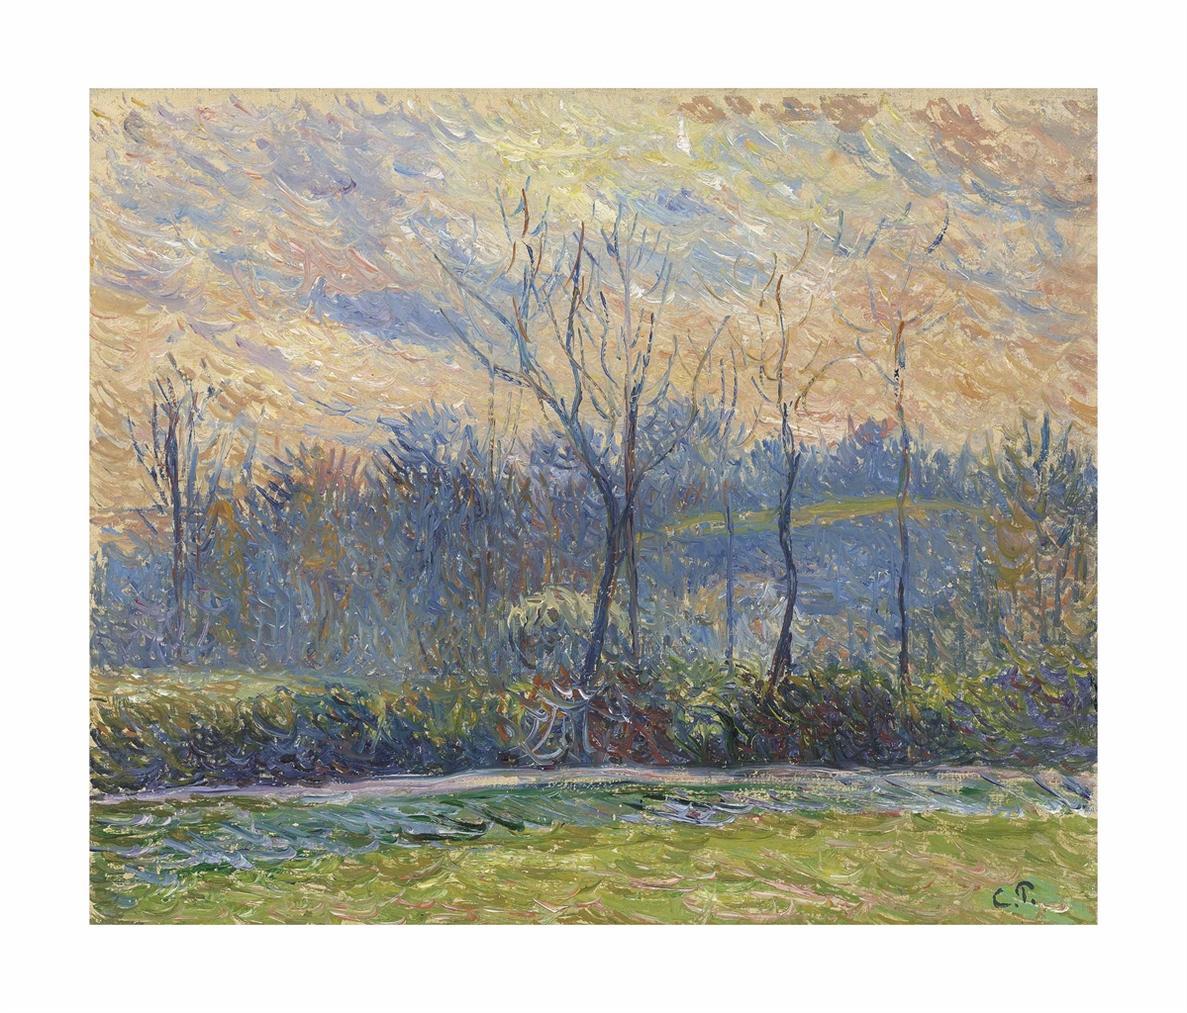 Camille Pissarro-Soleil Couchant, Hiver-1885